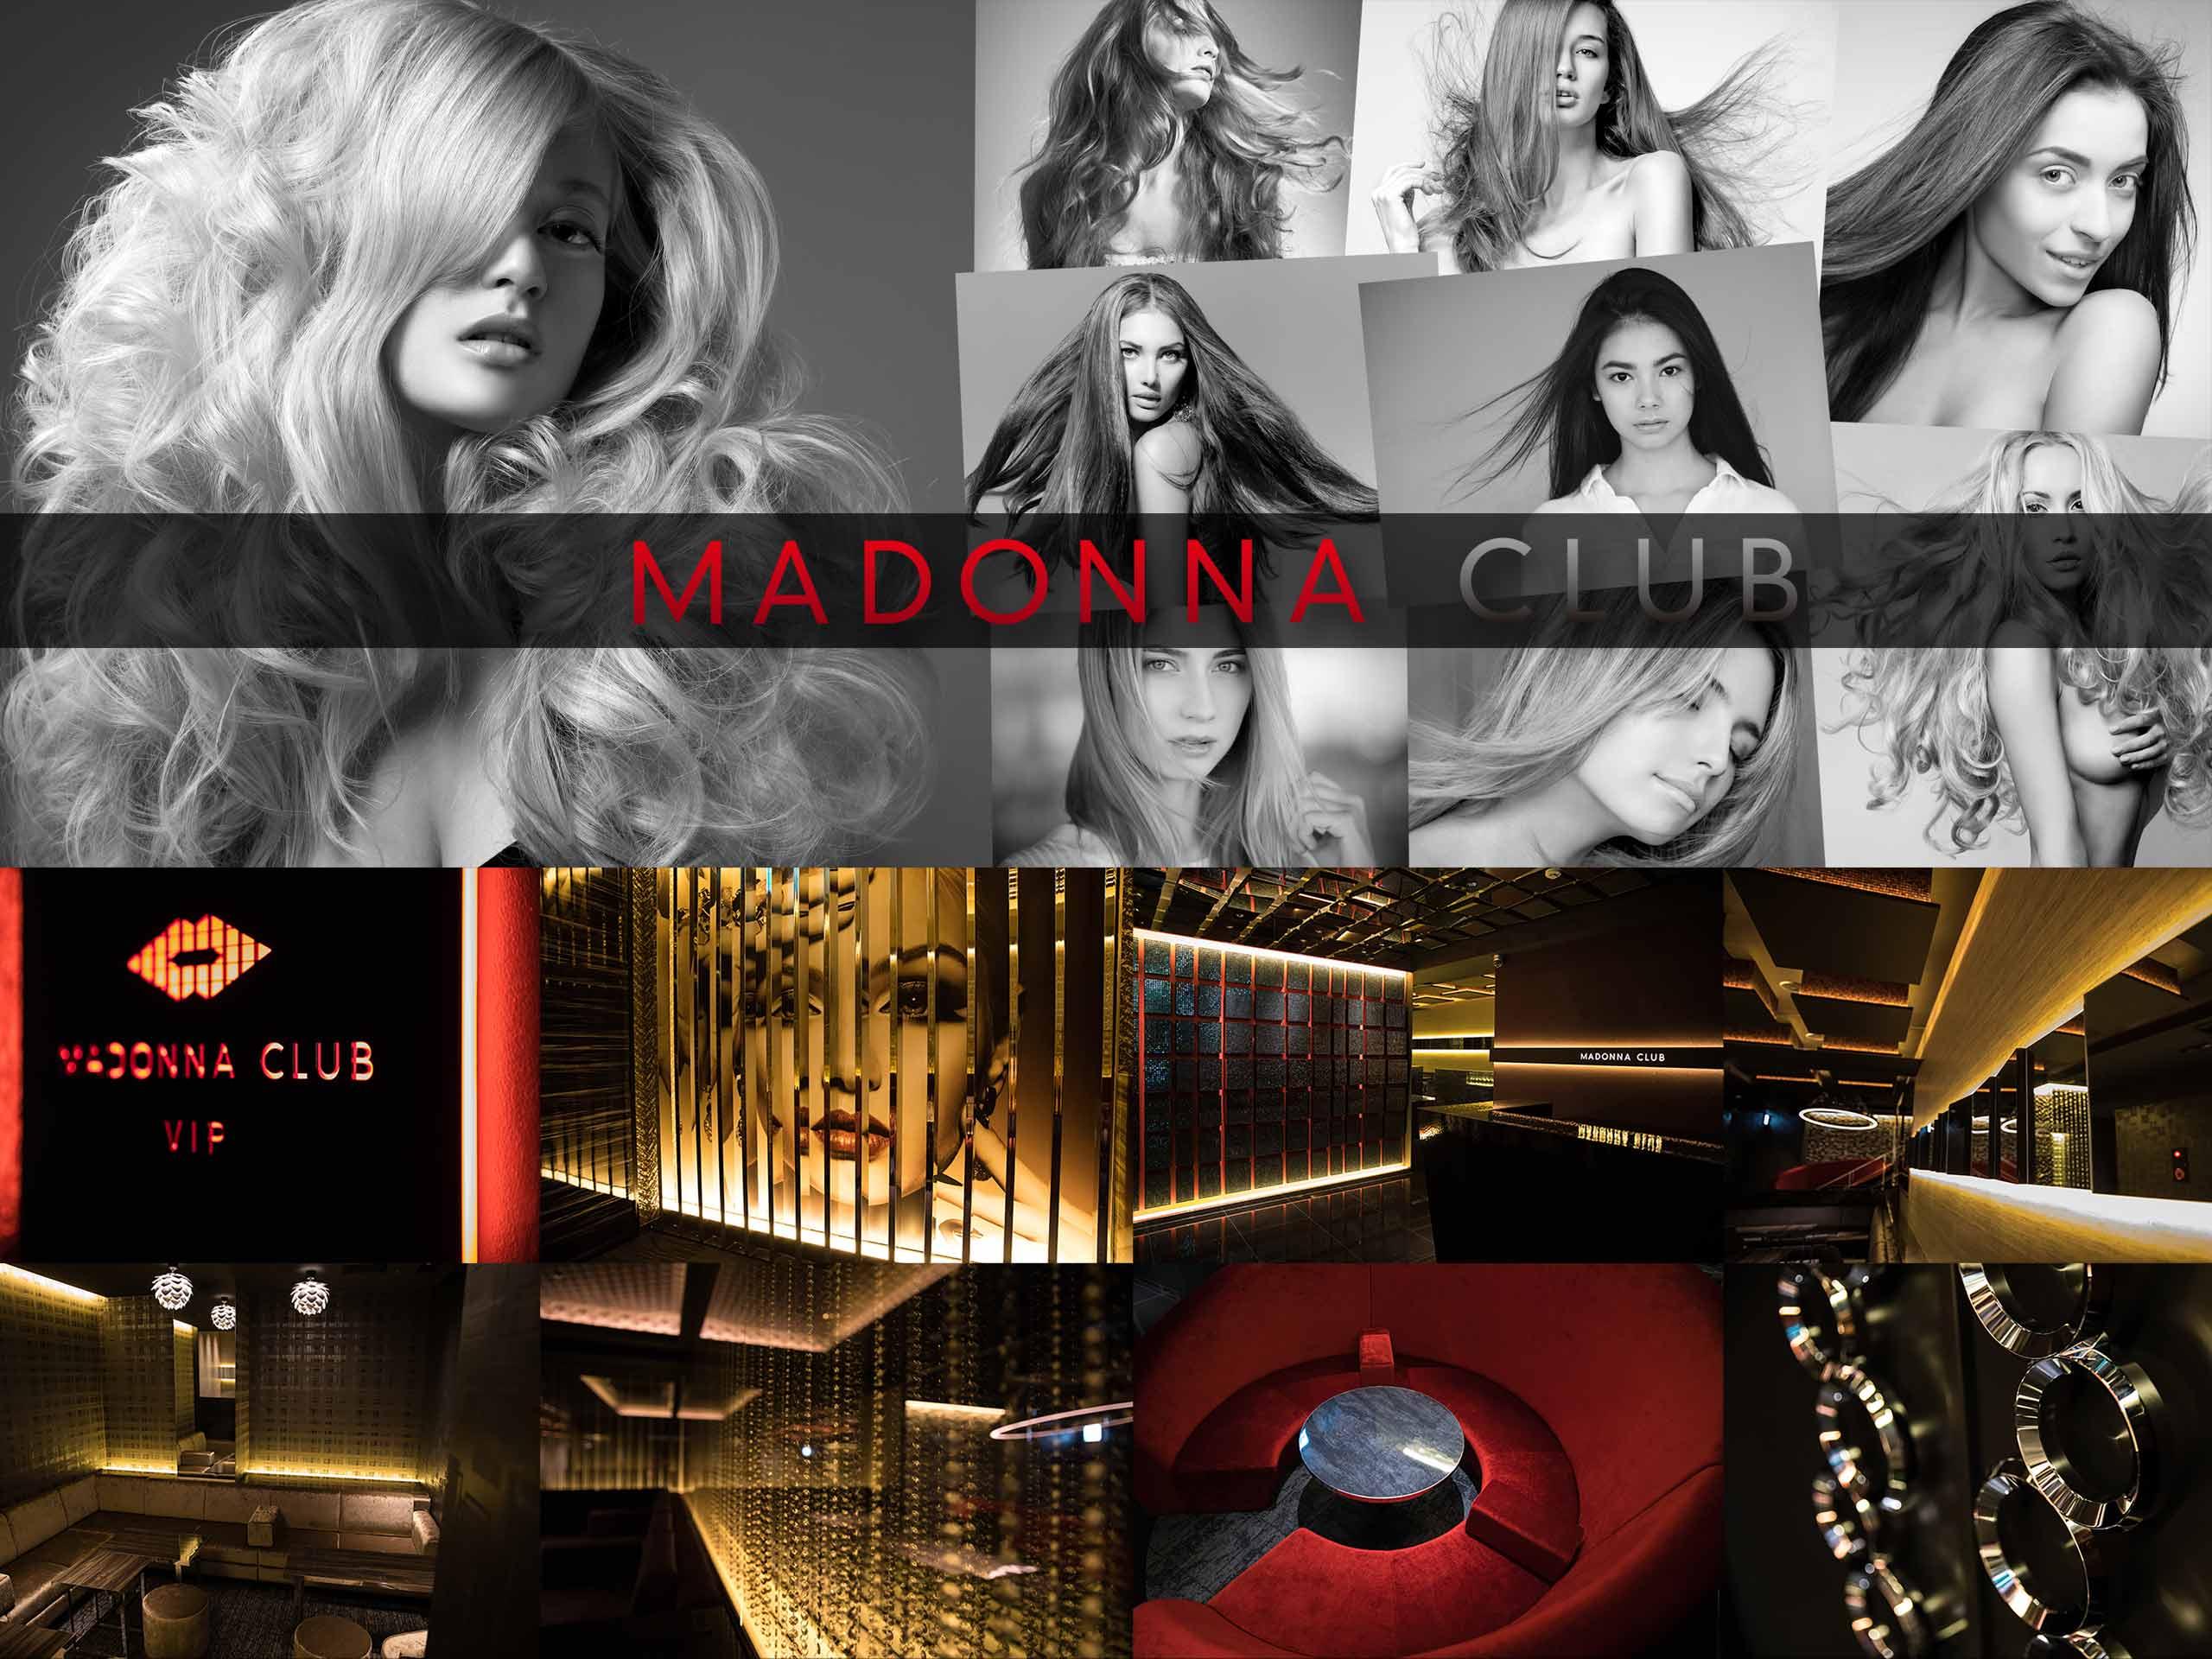 MADONNA CLUBイメージ画像